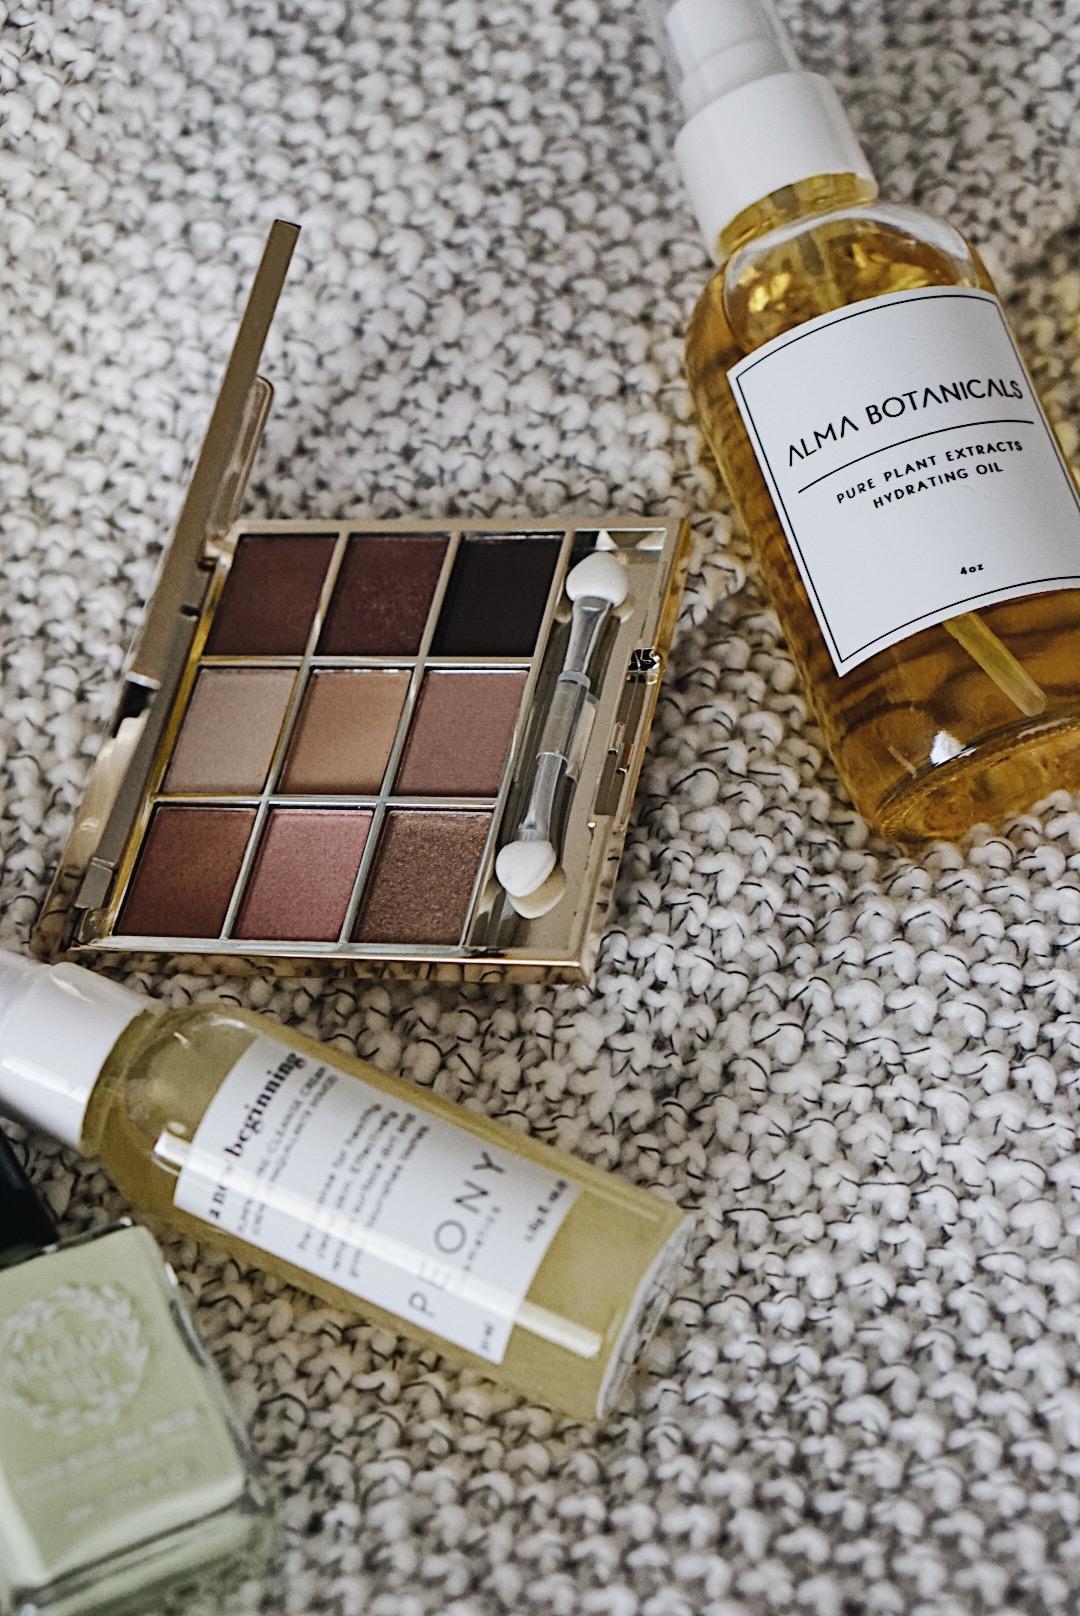 Nourish-Beauty-Box-Alma-Botanicals-Seraphine-Botanicals-Peony-Cosmetics-Cruelty-Free-Beauty